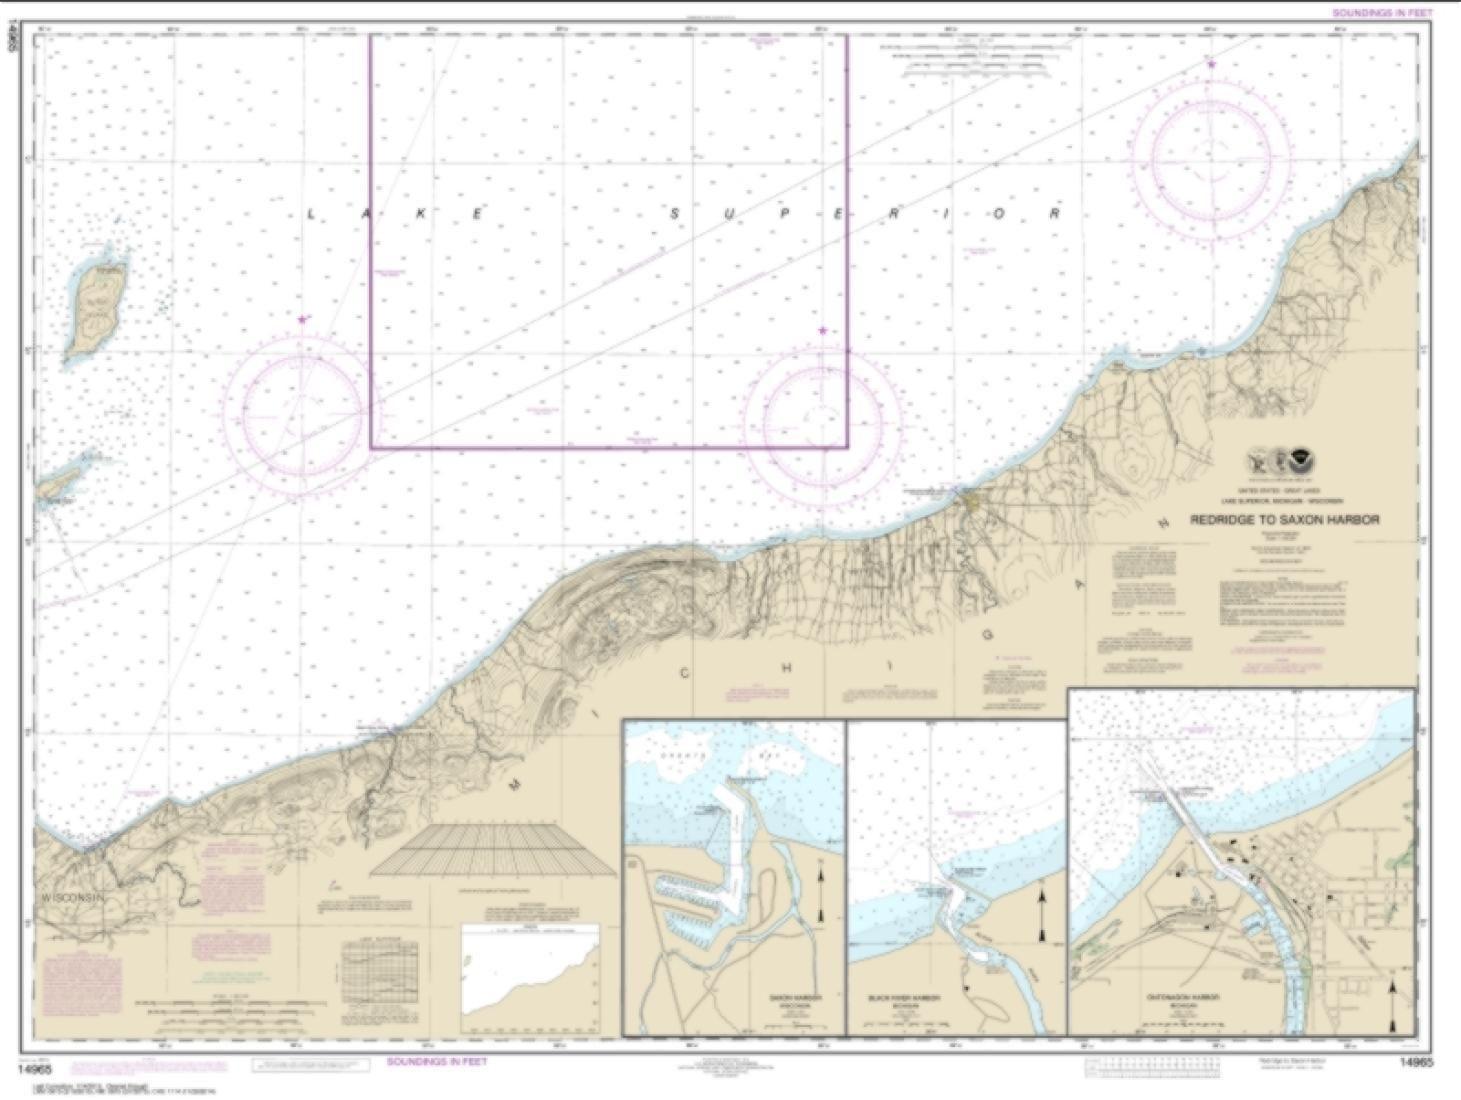 Redridge to Saxon Harbor; Ontonagon harbor; Black River Harbor; Saxon Harbor (14965-23) by NOAA